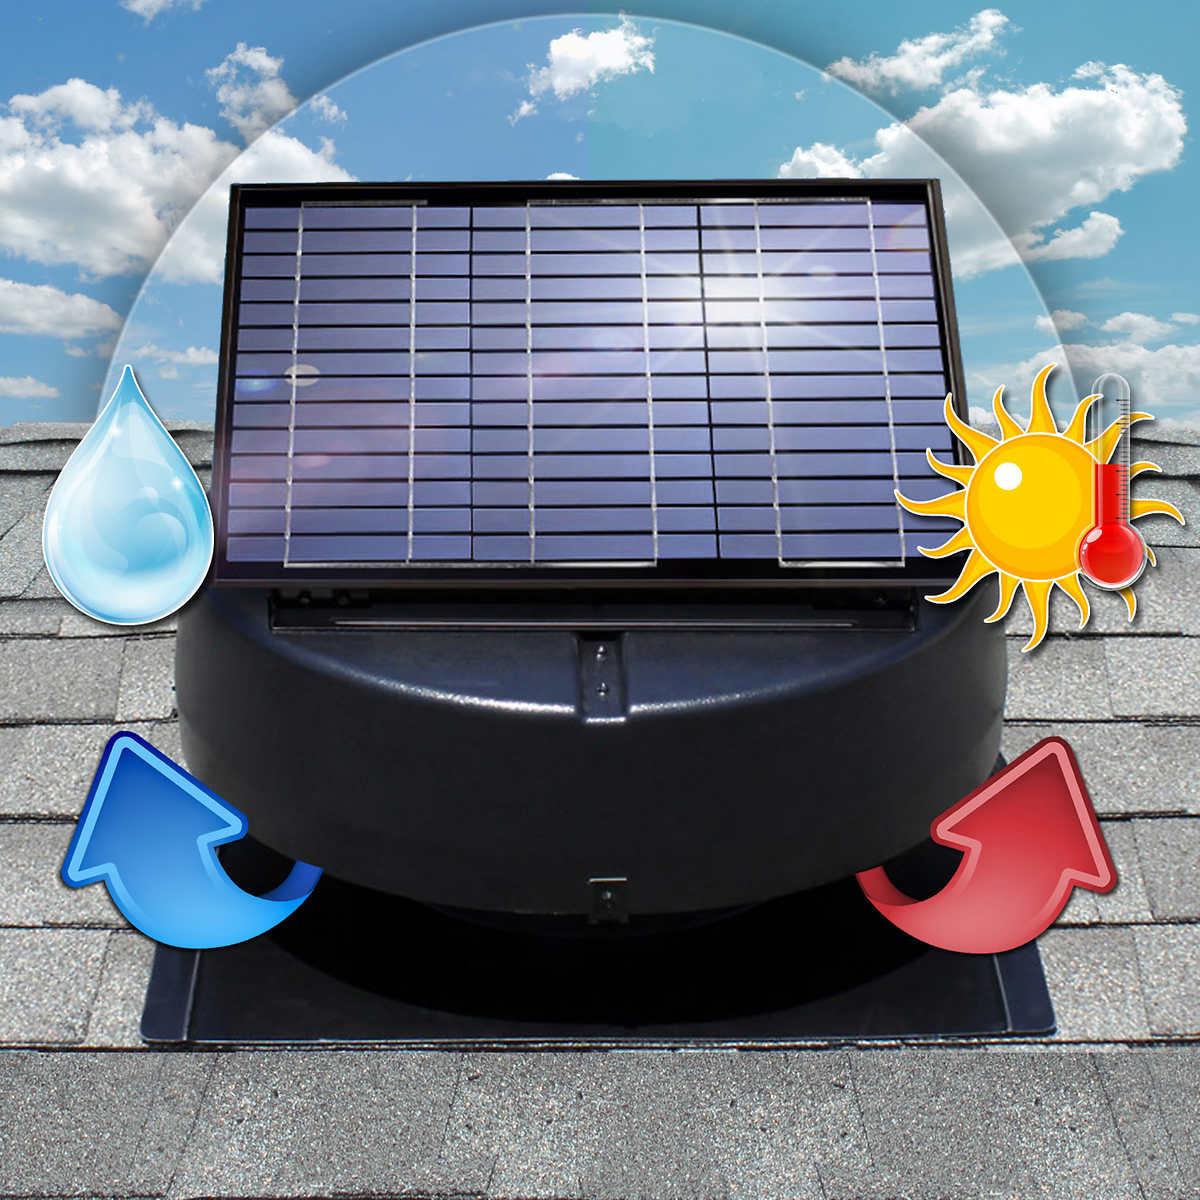 Solar star attic fan complaints - Solar Attic Fan Ventilates 2 800 Sq Ft